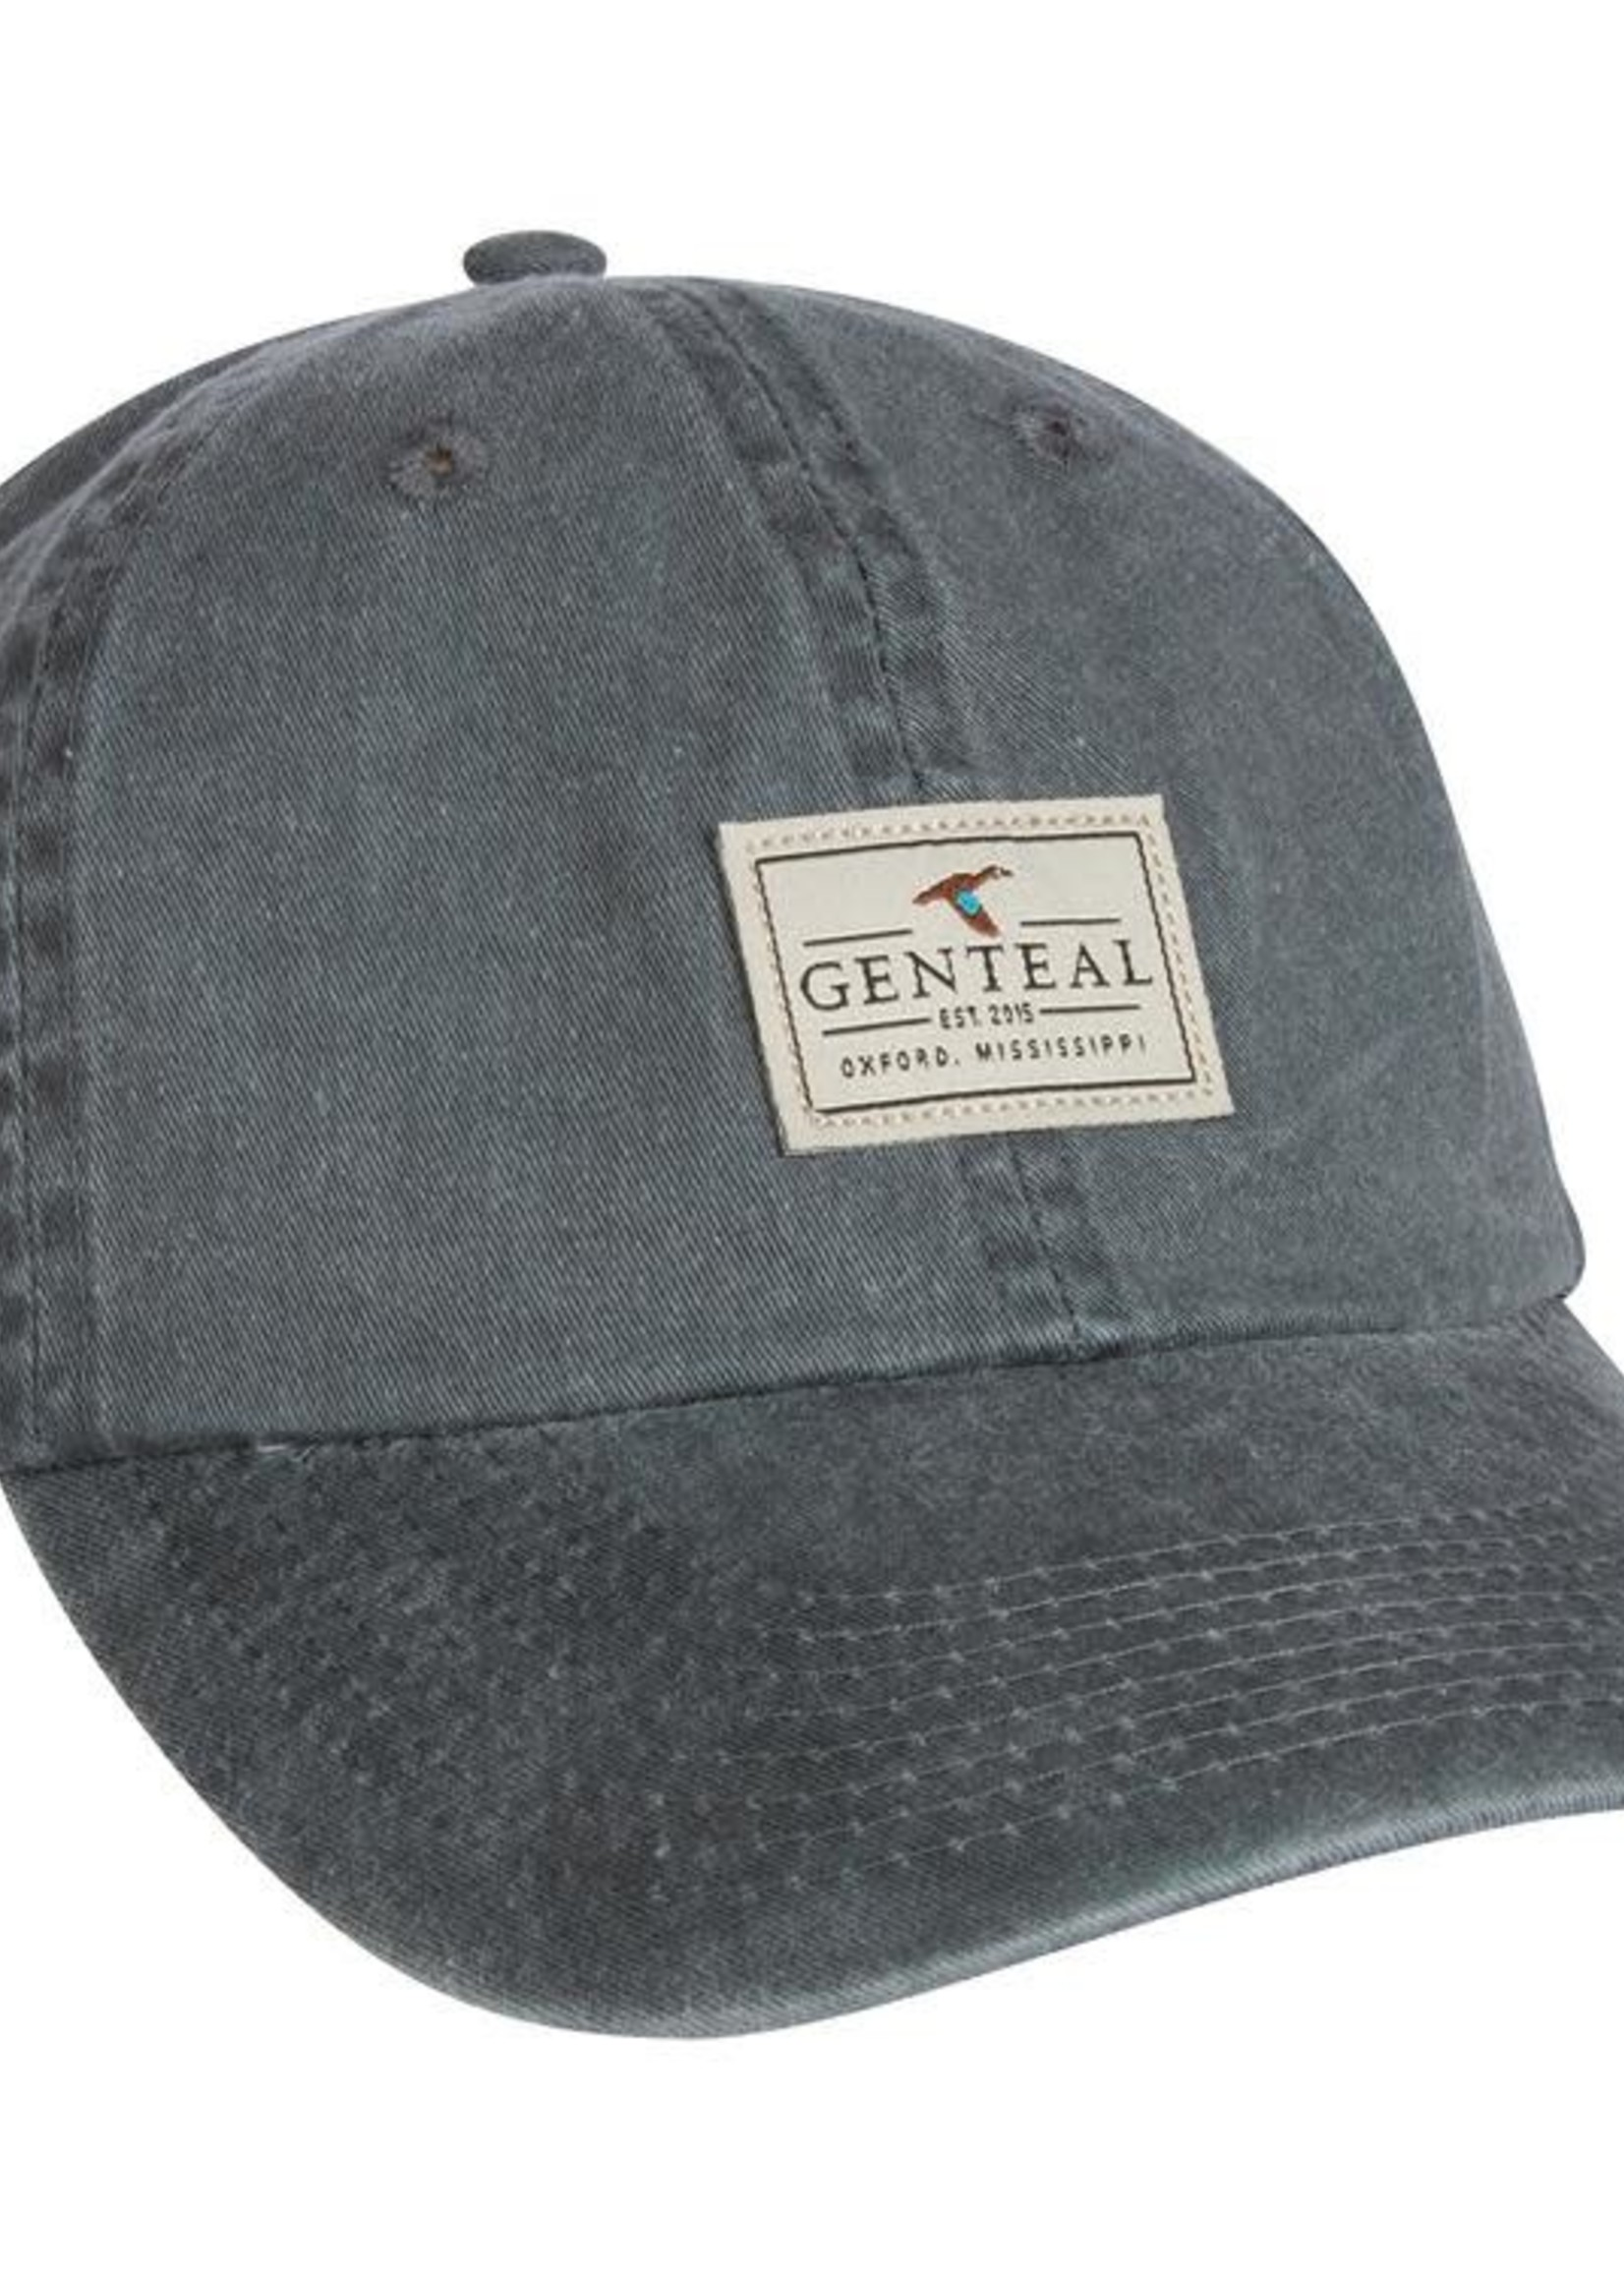 GenTeal Apparel Patch Hat